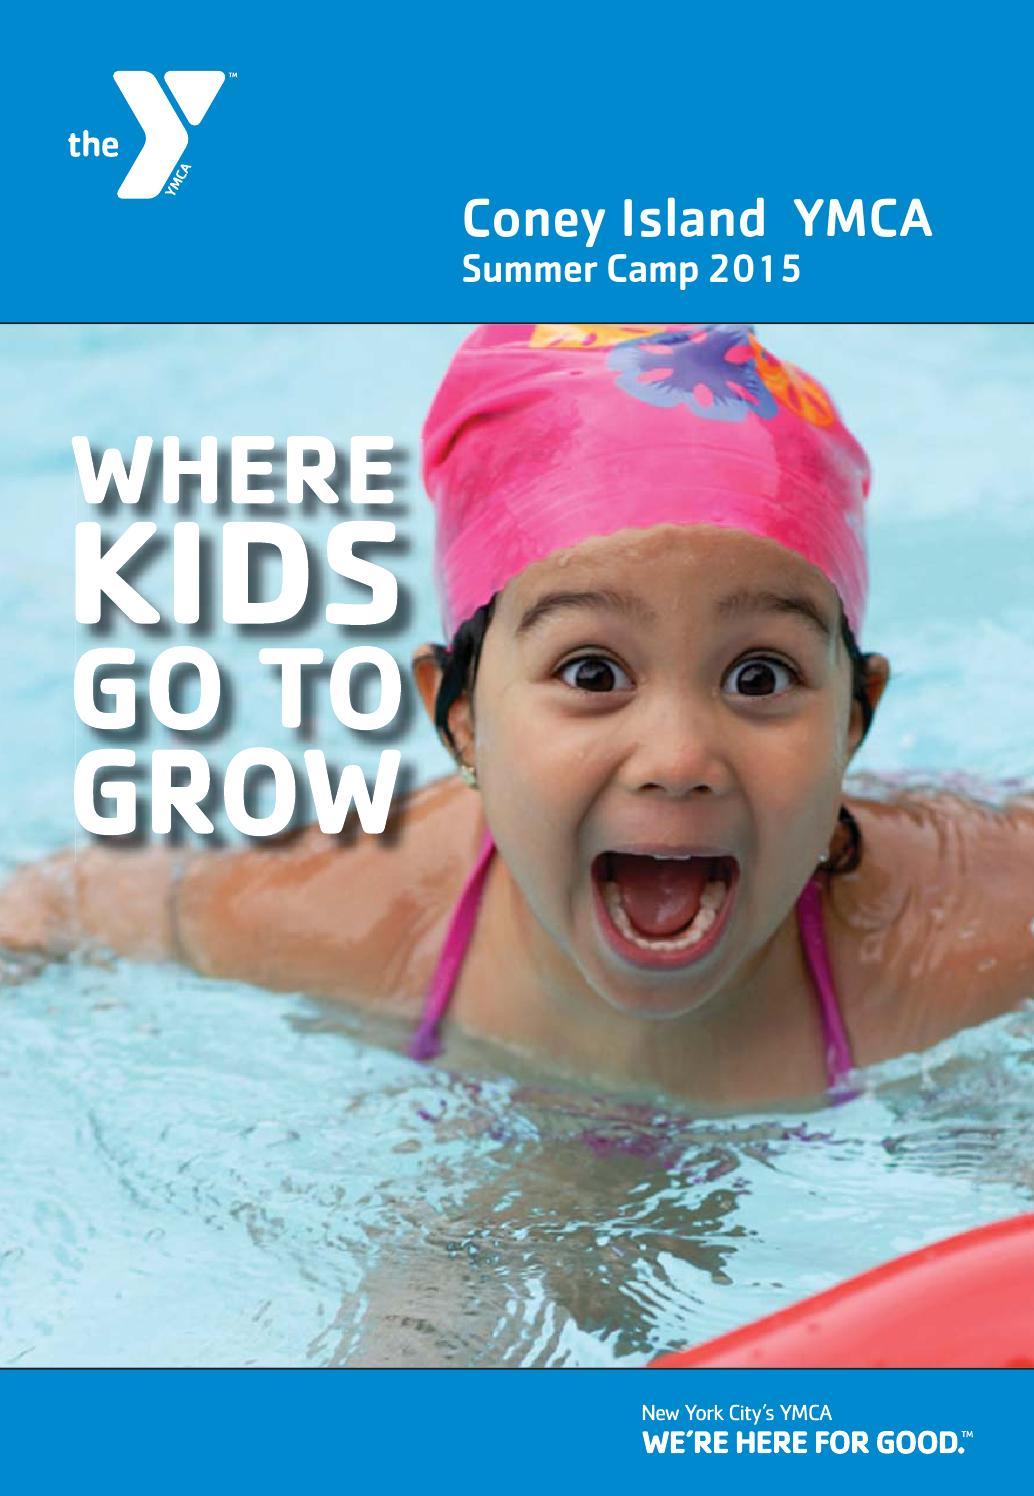 Ymca Coney Island Summer Camp